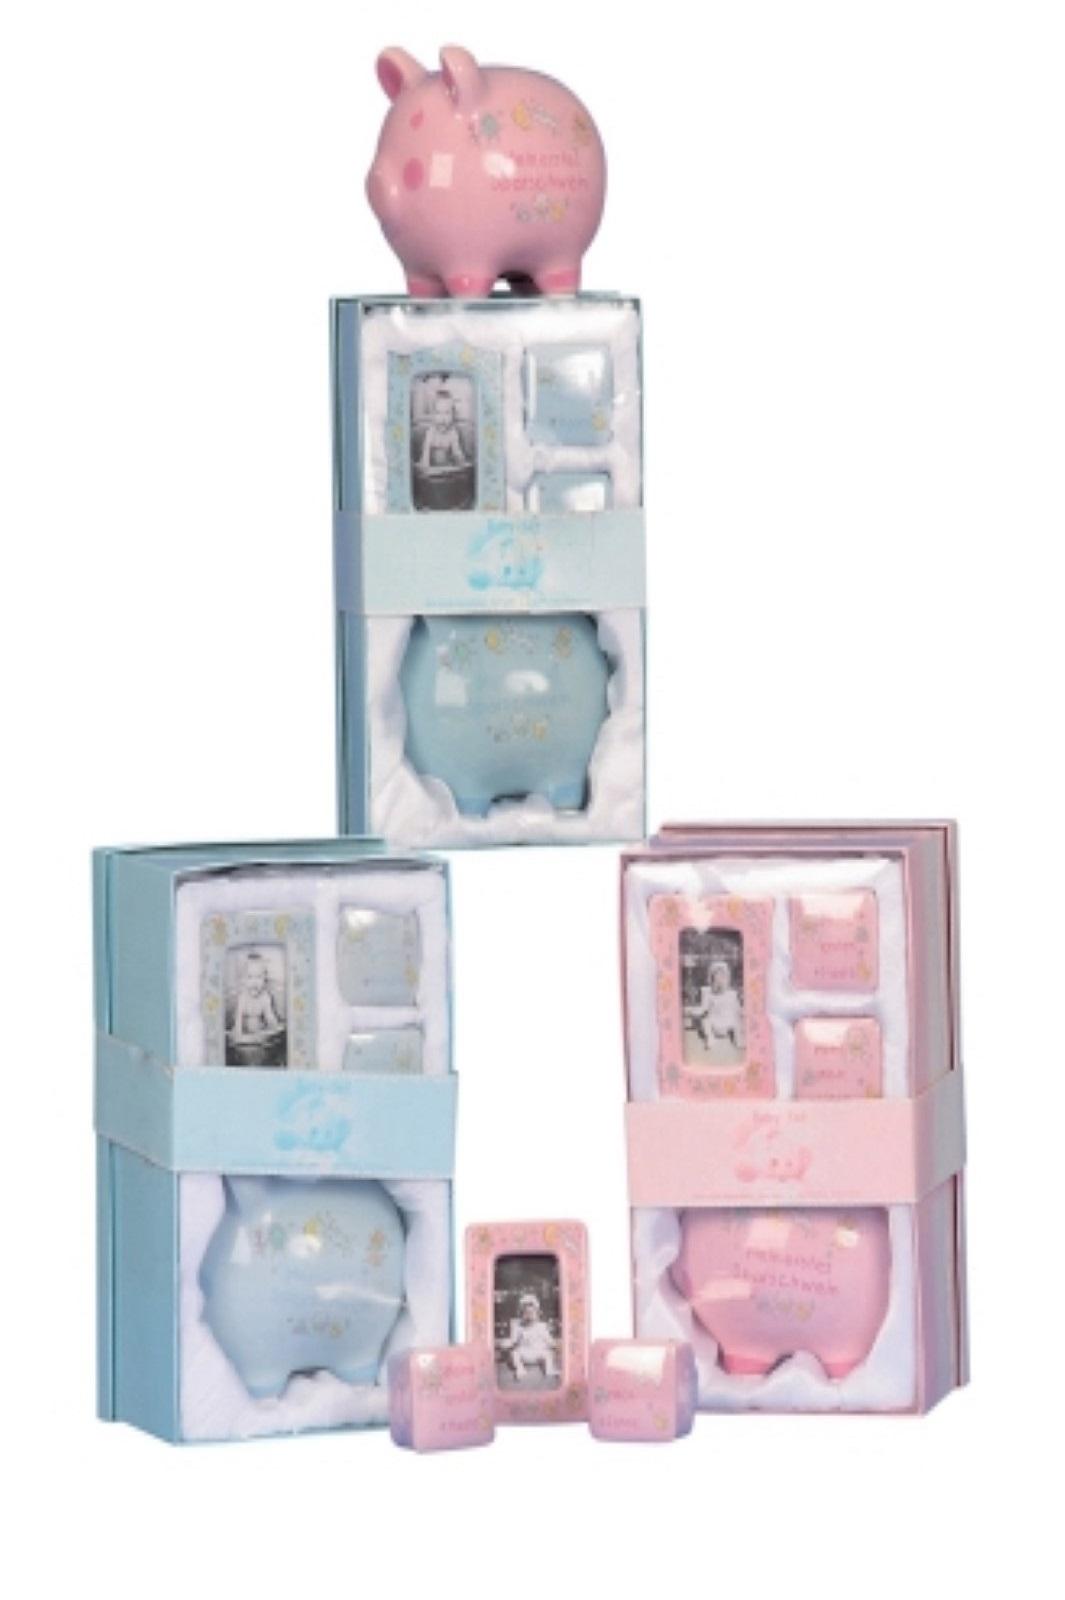 Baby-Set 27x17cm Sparschwein, Fotorahmen+2 Dosen Blau o. Rosa Stückp.